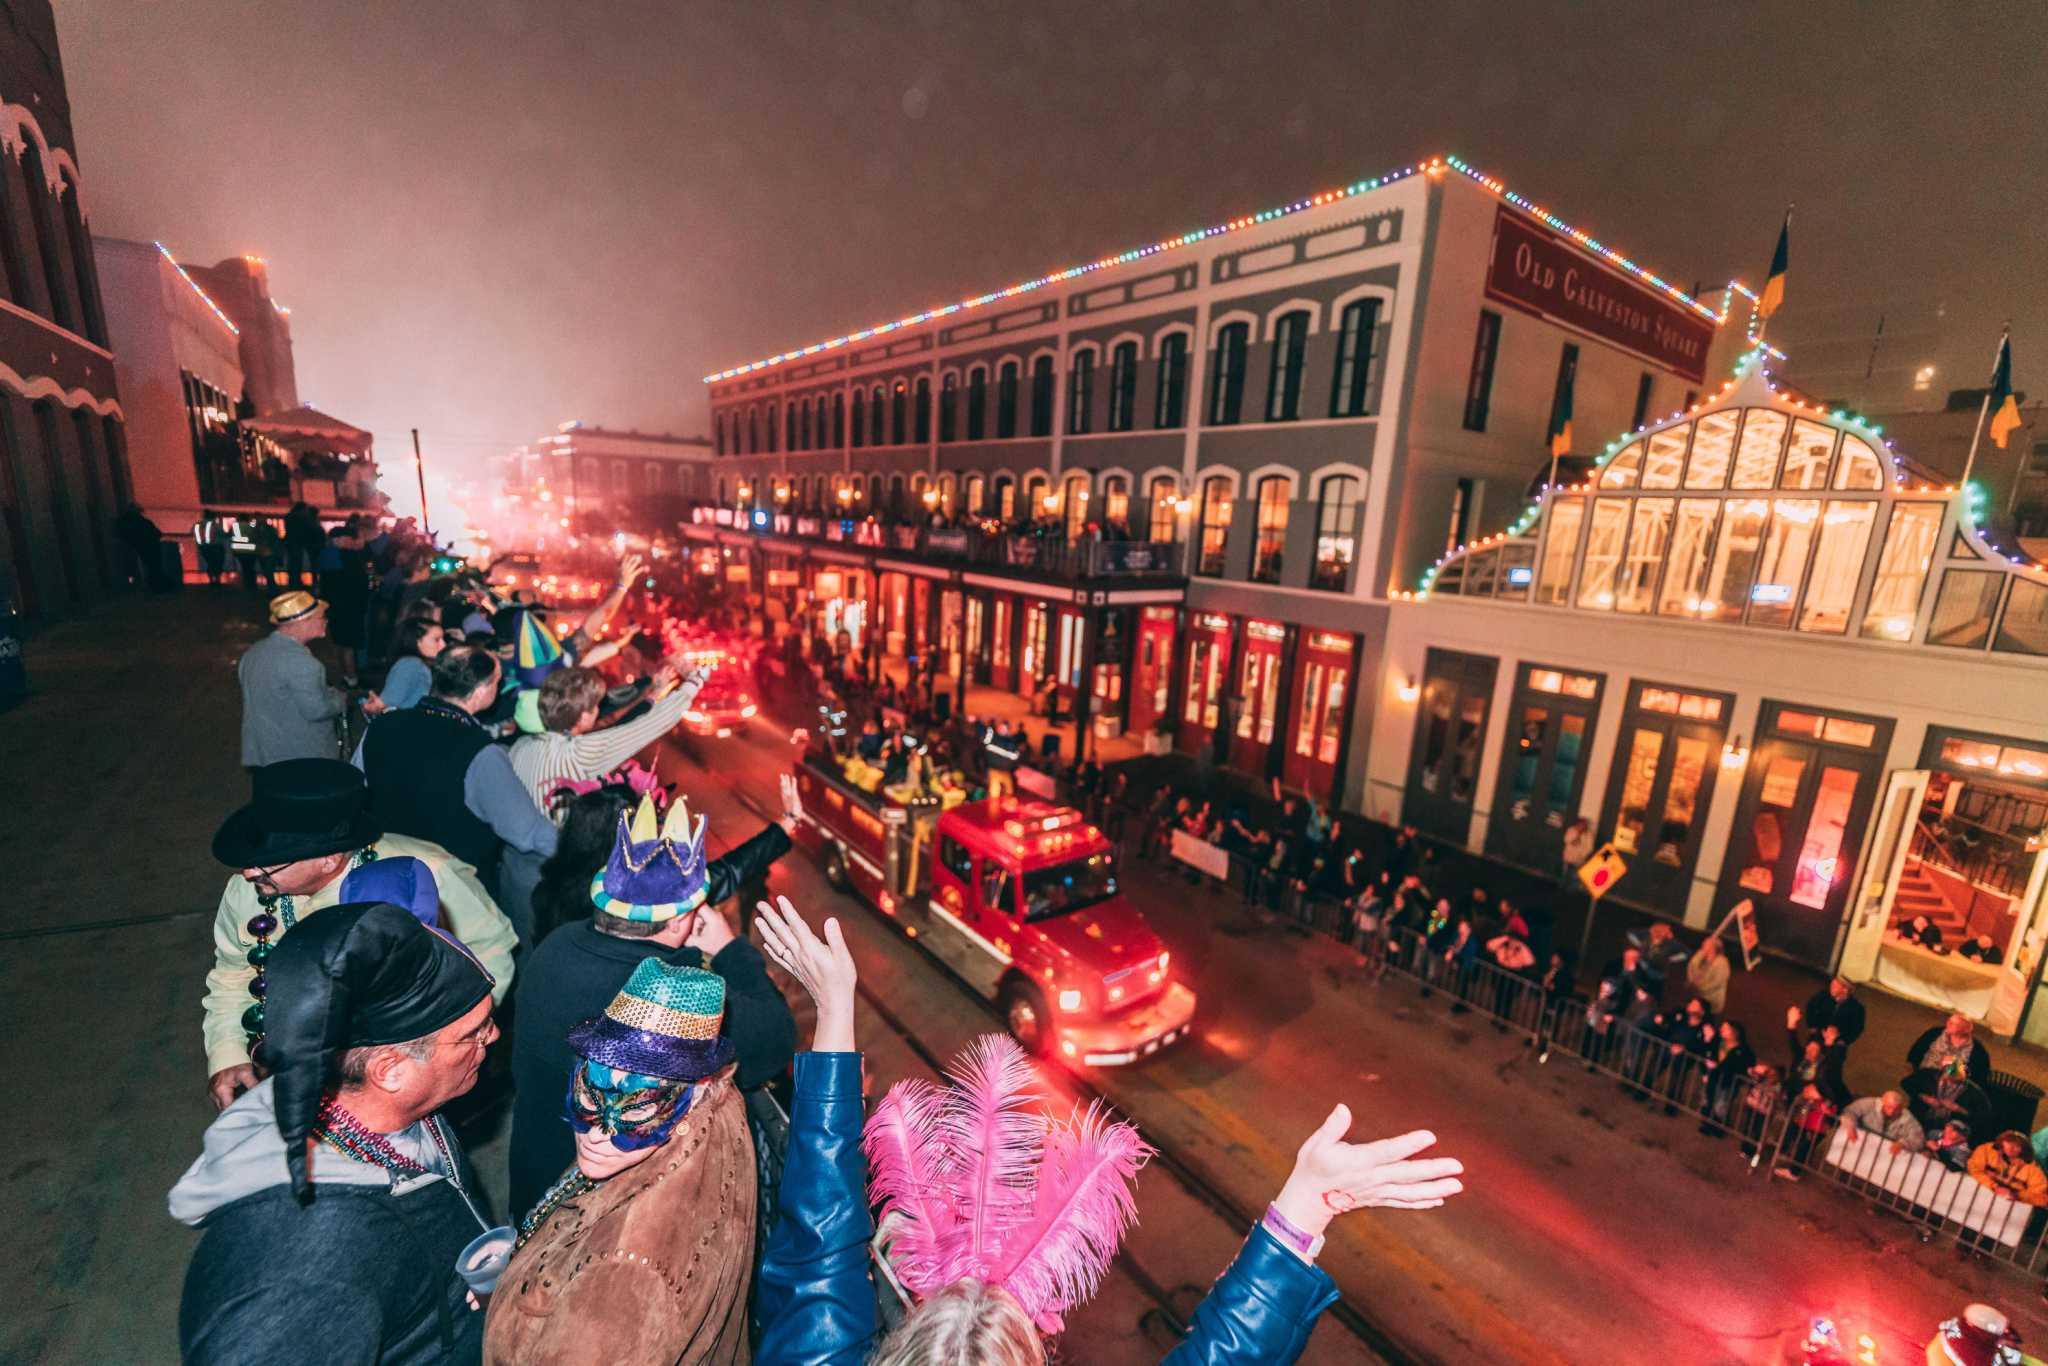 Galveston S Mardi Gras Celebration Officially Canceled Due